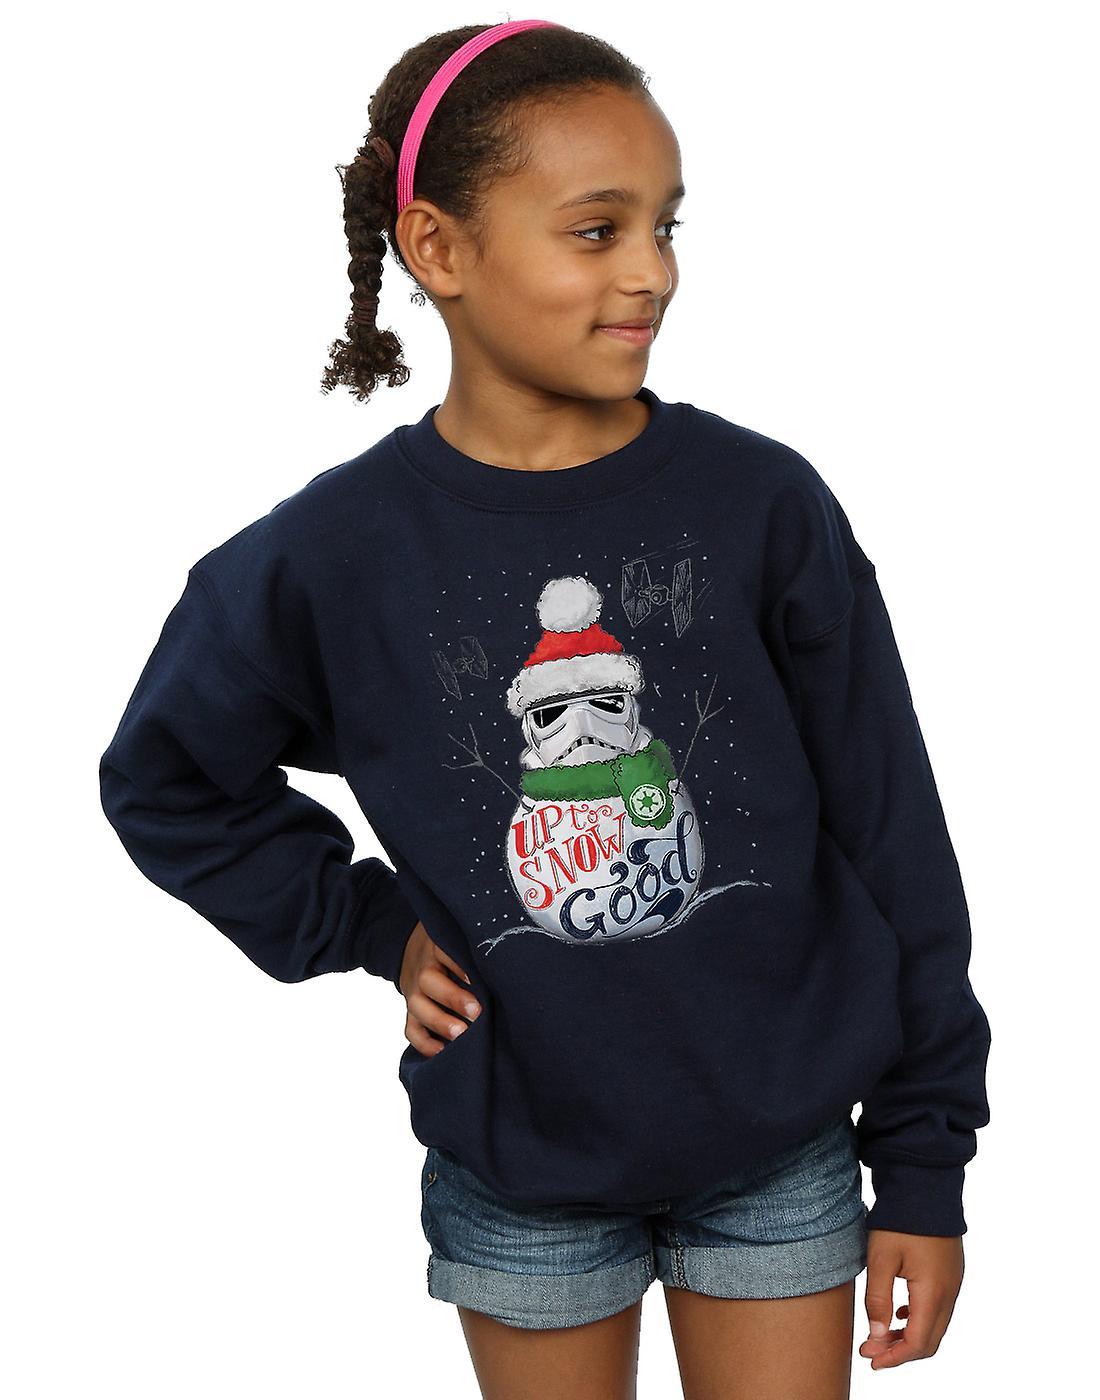 Star Wars Girls Stormtrooper Up To Snow Good Sweatshirt